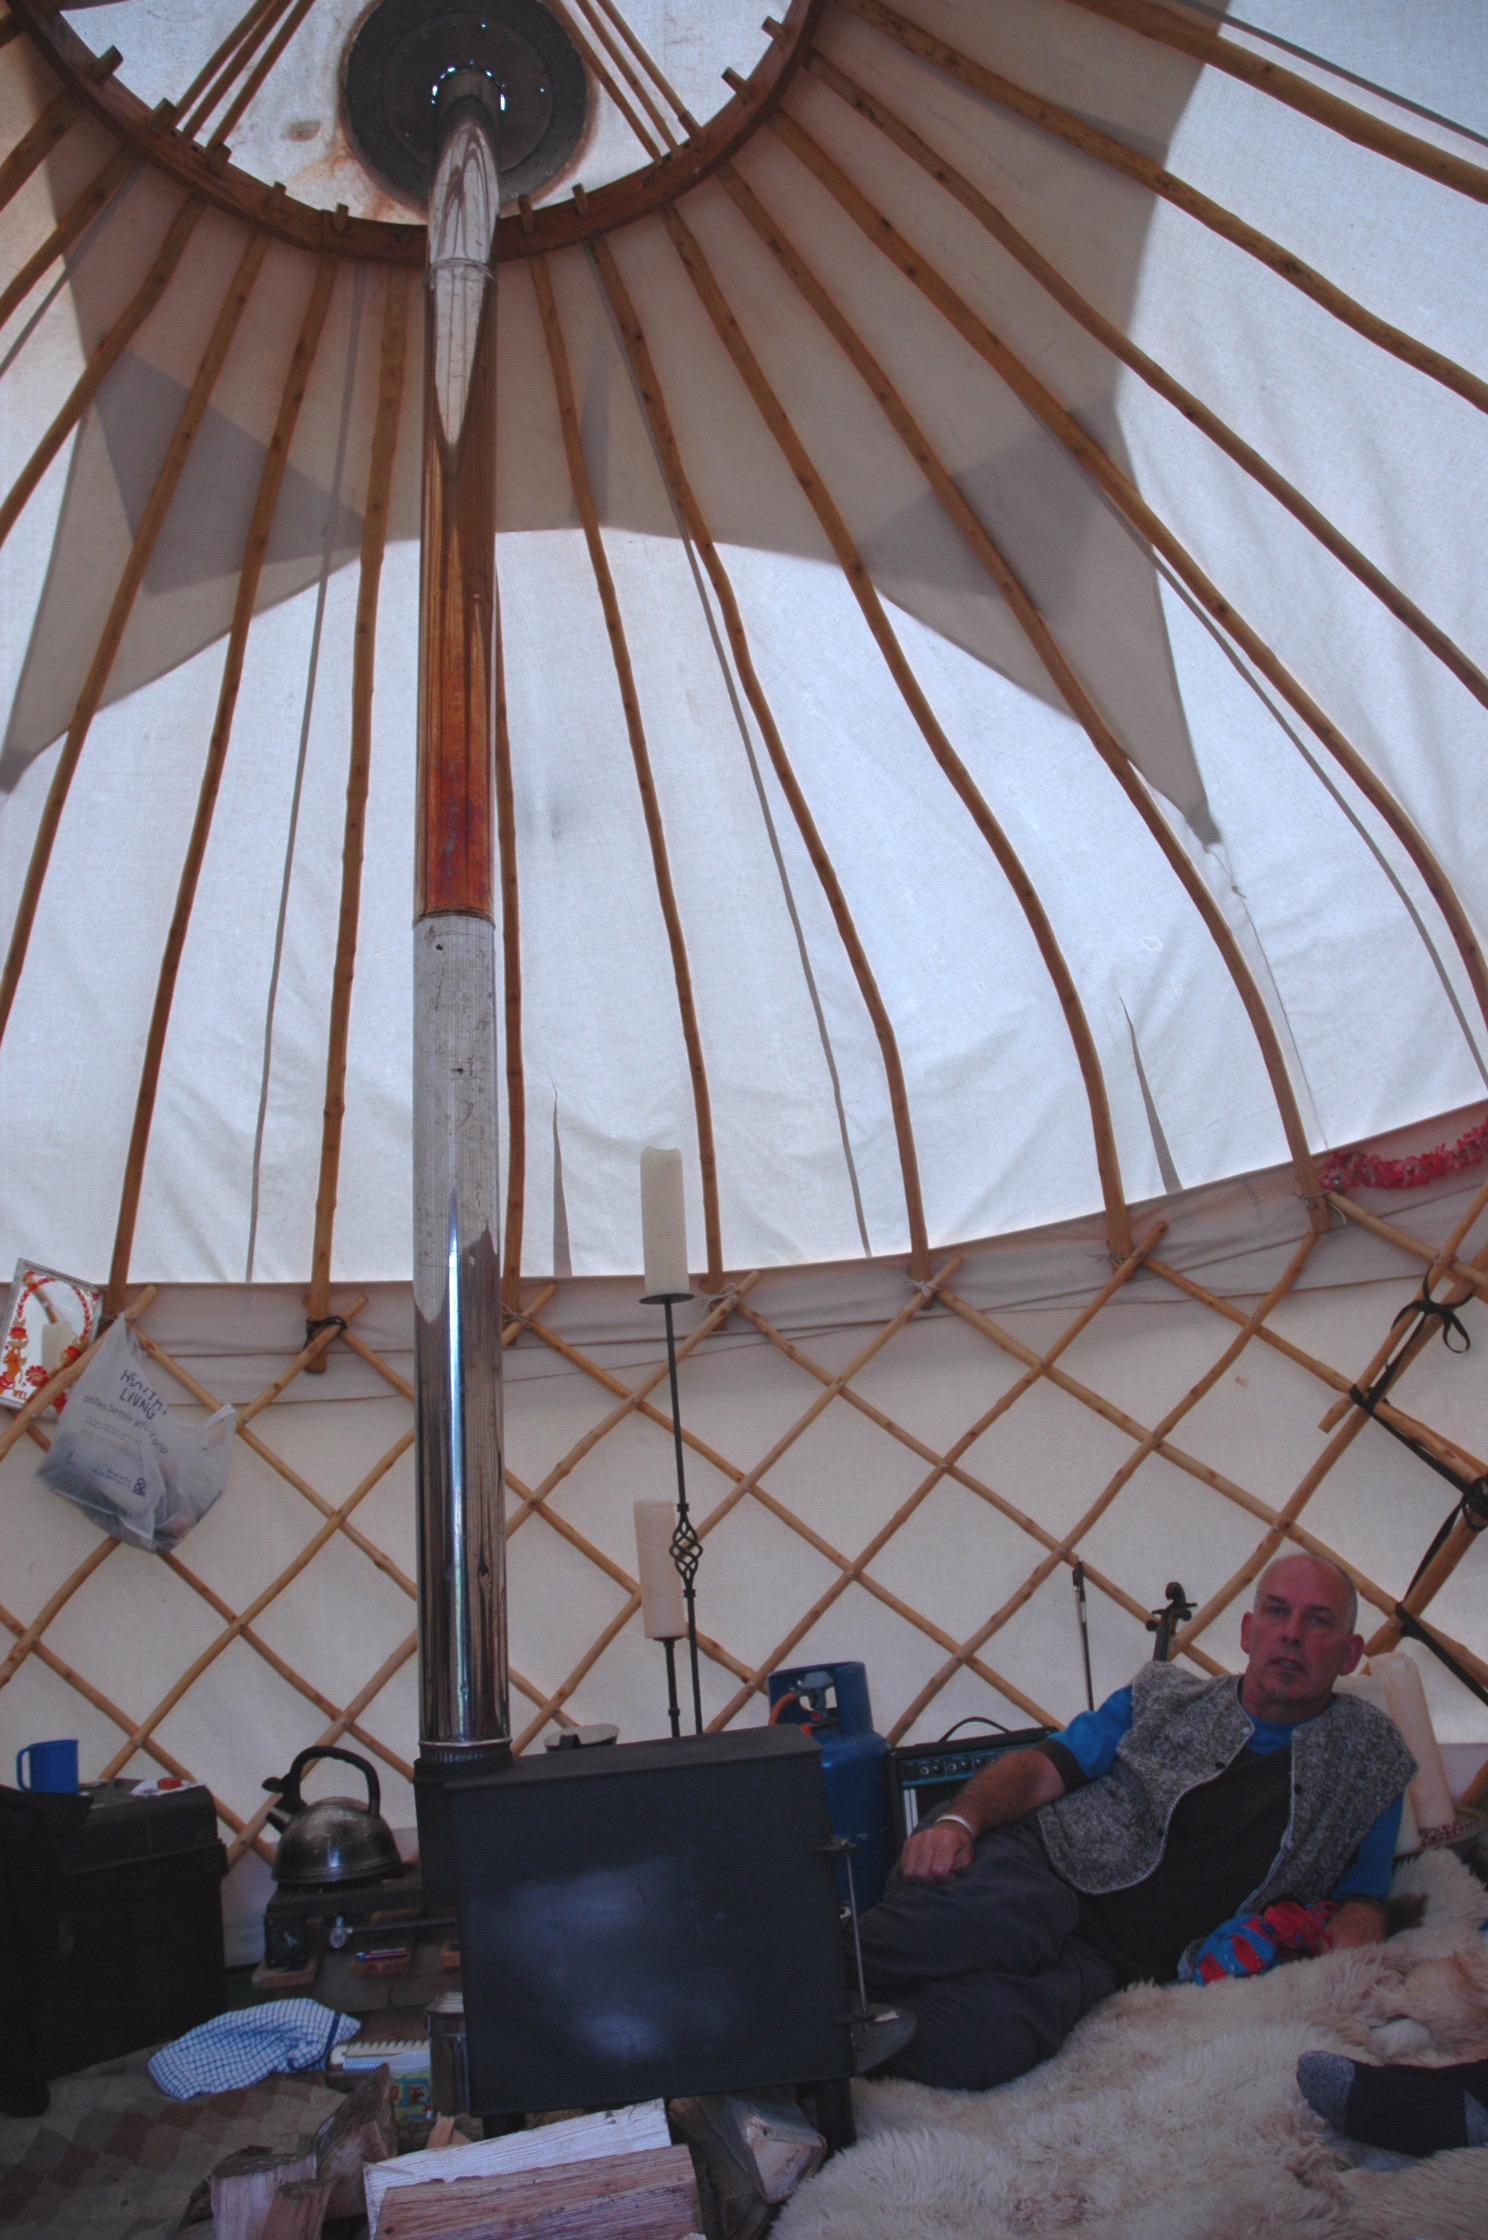 My Yurt Peter Deadman